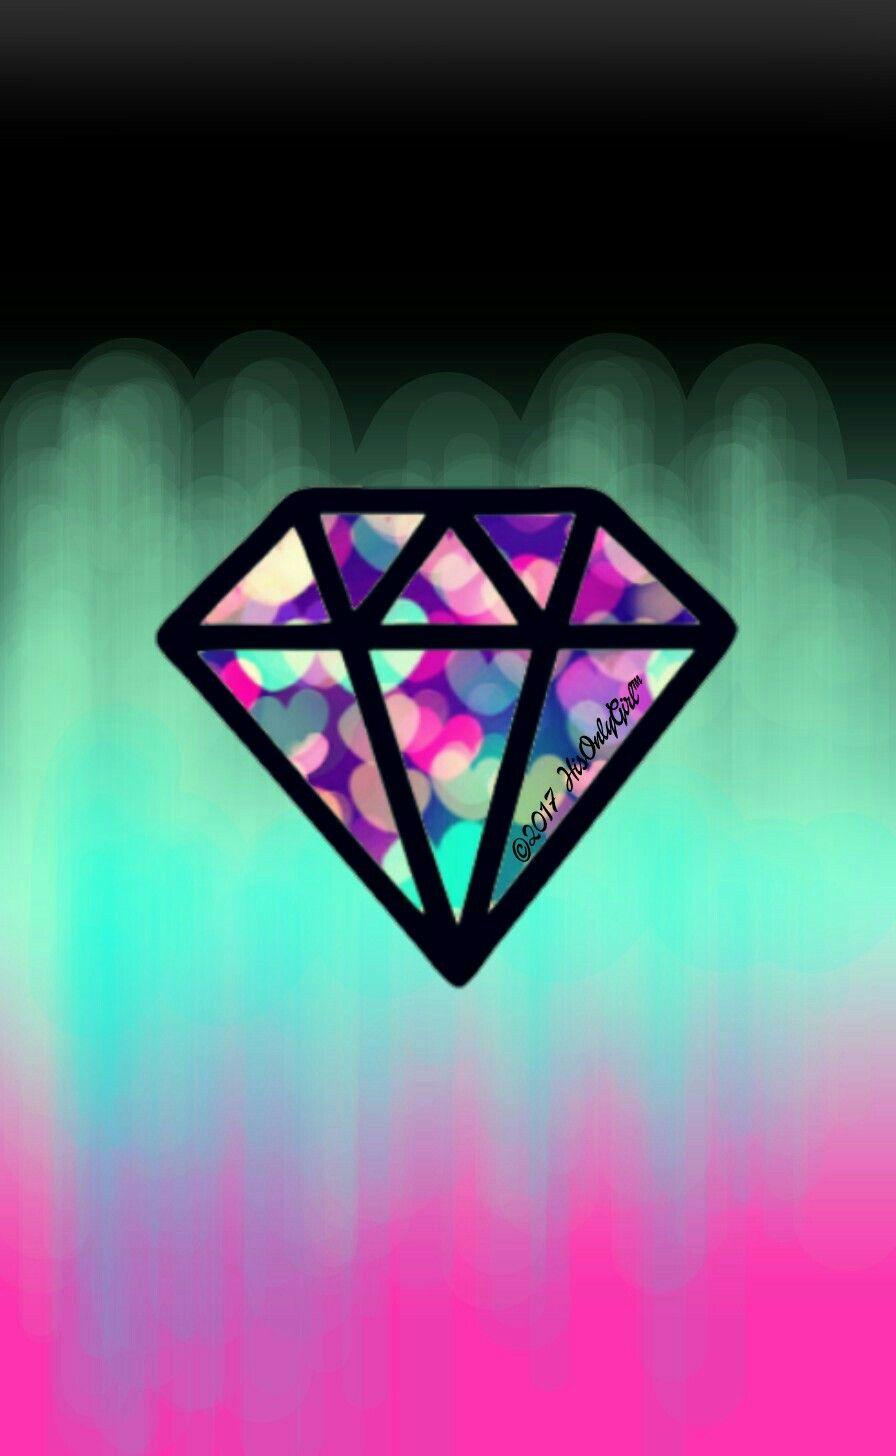 Gradient diamond wallpaper I created for the app CocoPPa